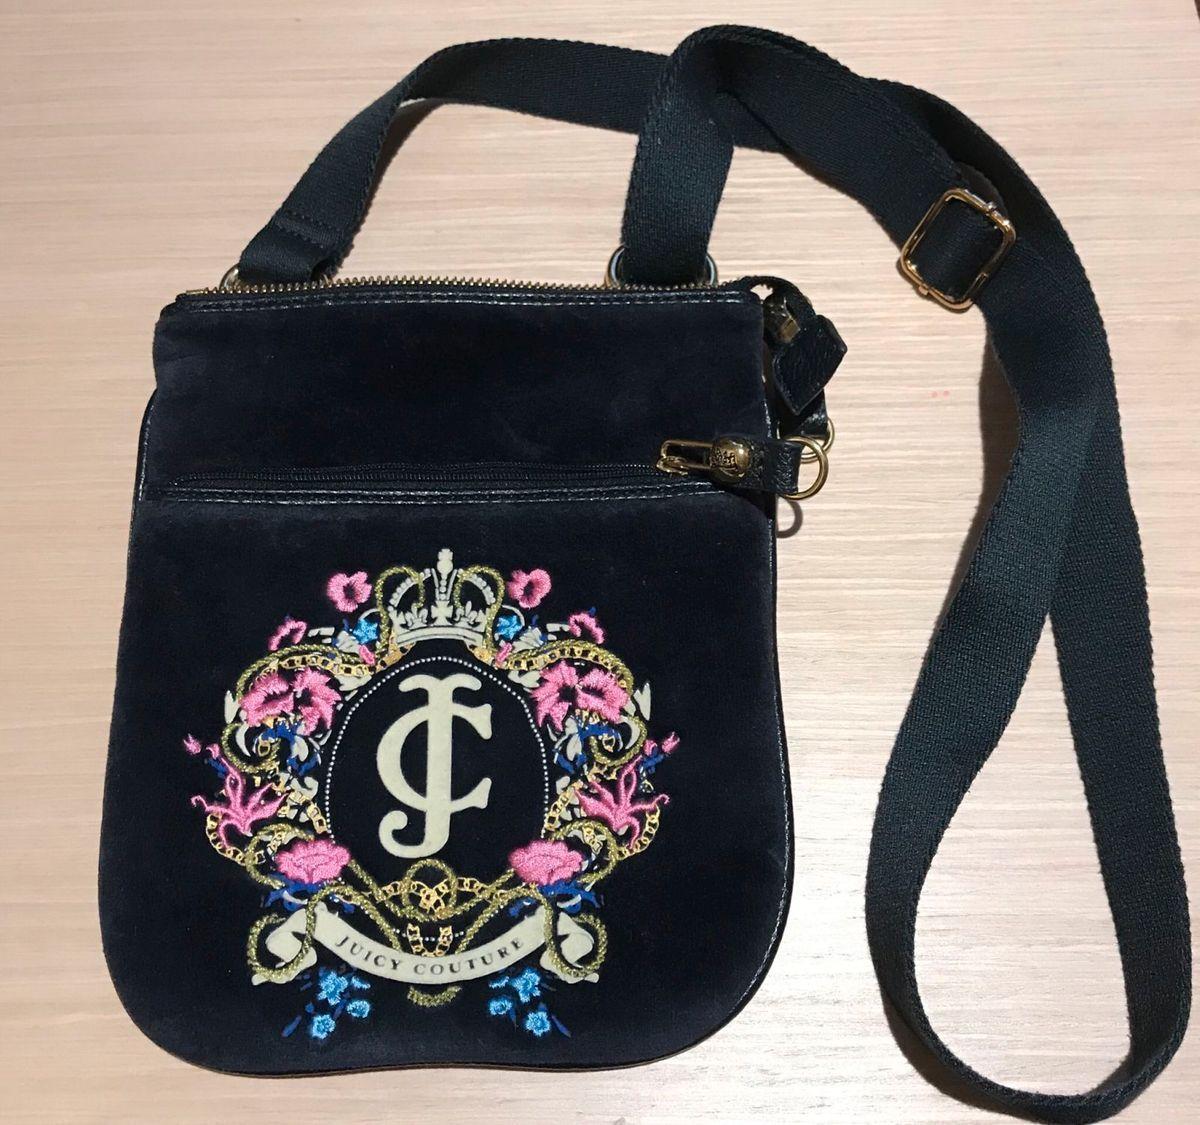 bolsa juicy couture - bolsas juicy couture